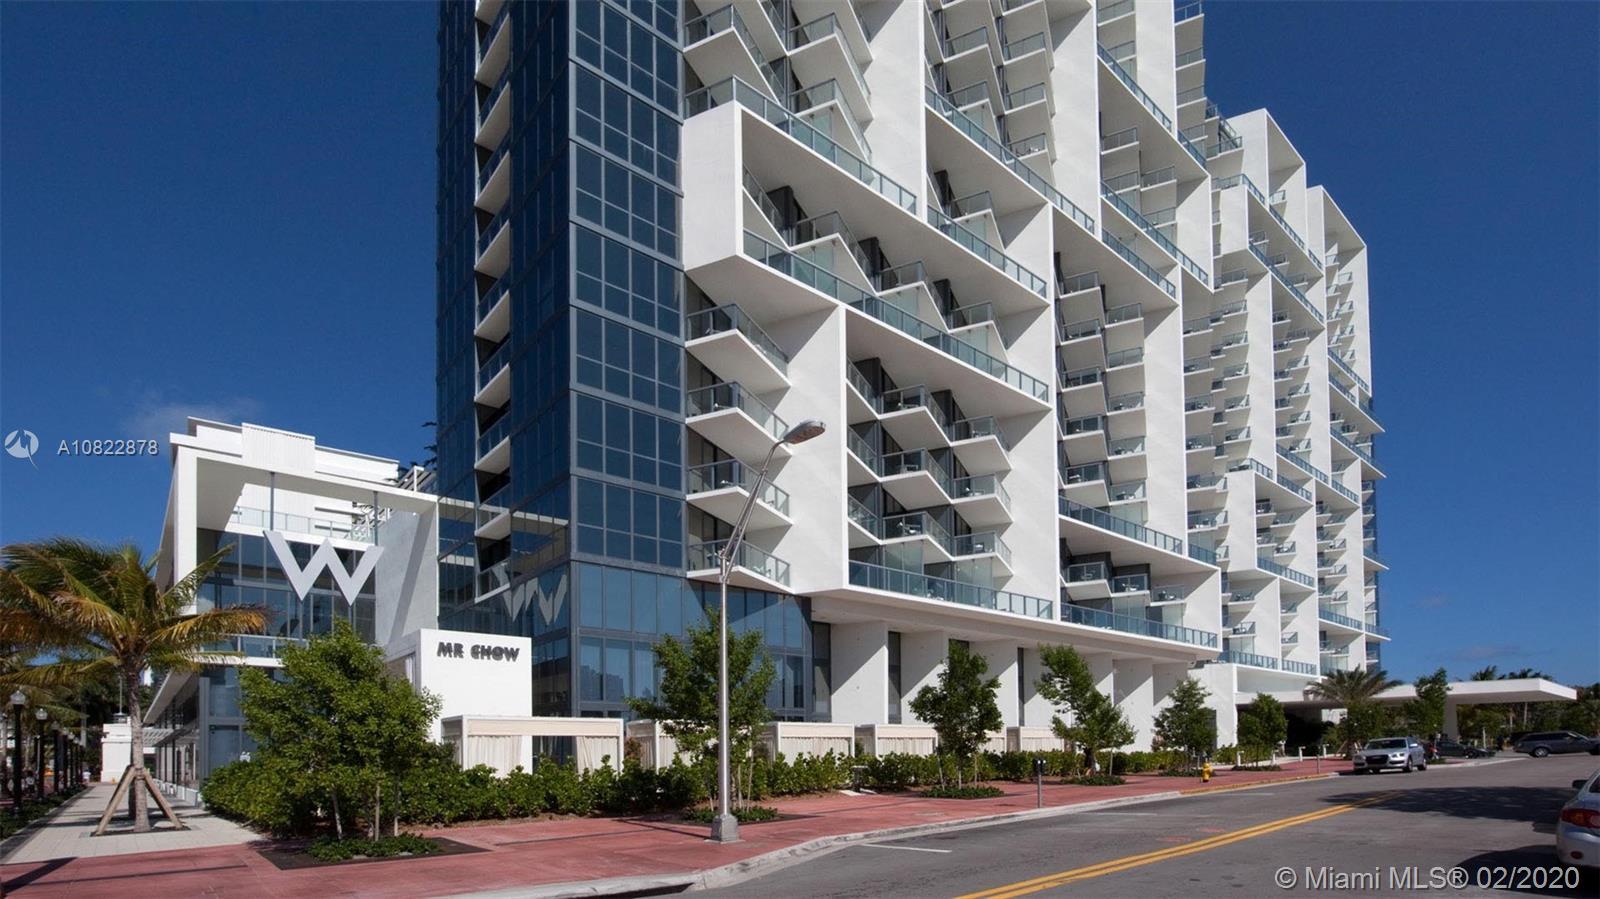 2201 COLLINS AV, Miami Beach FL 33139